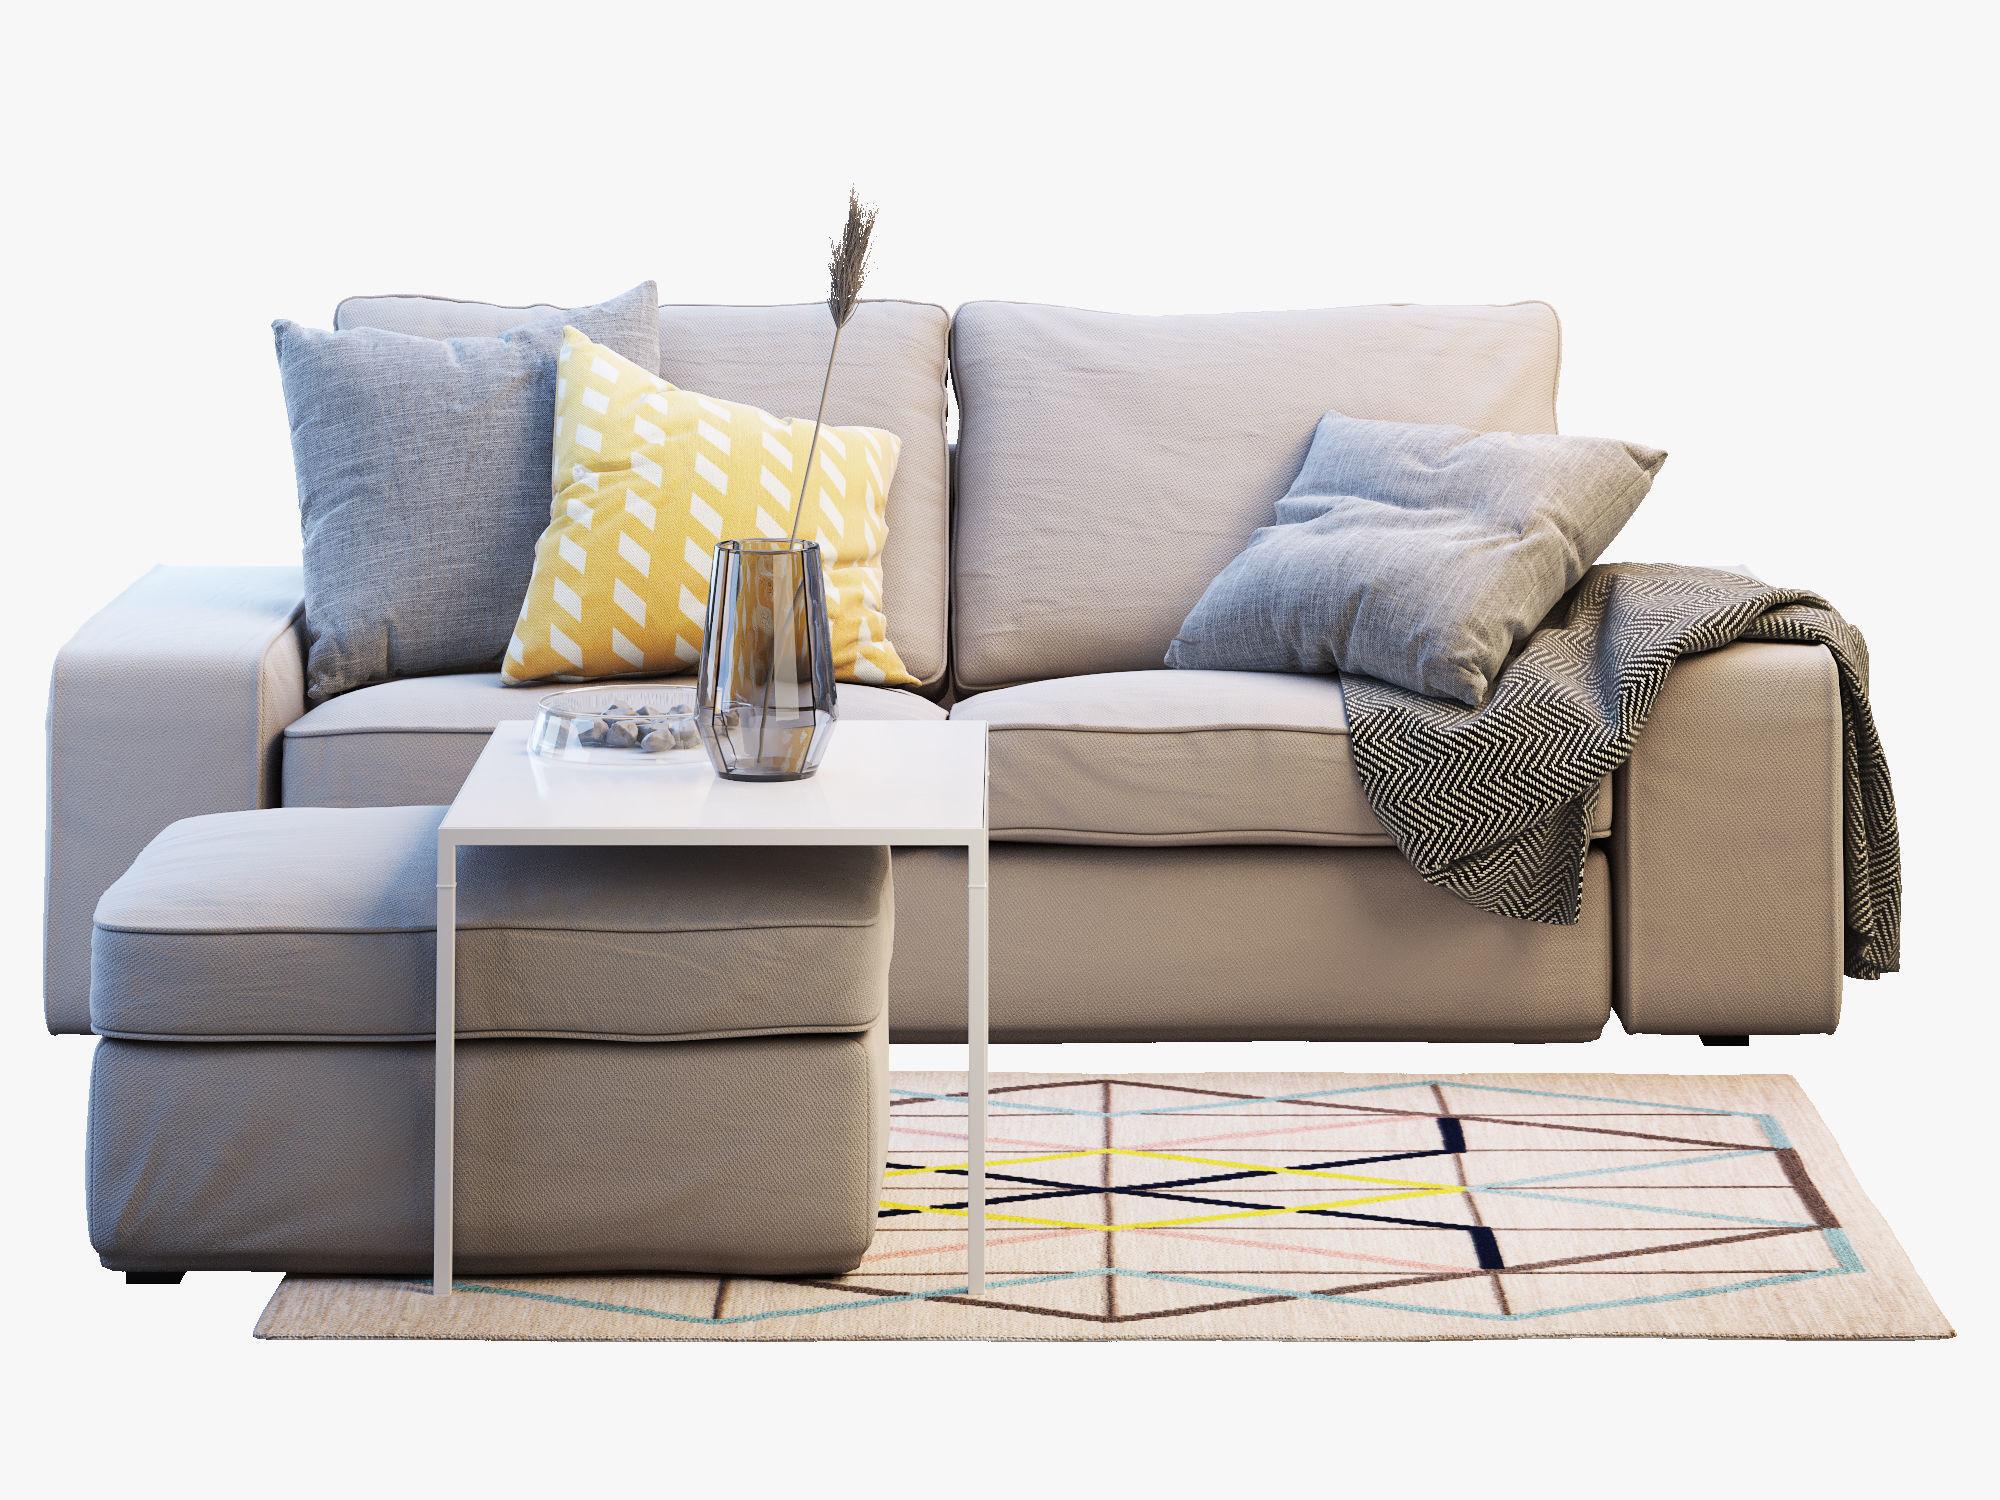 Two Seat Sofa IKEA KIVIK 2 3D CGTrader